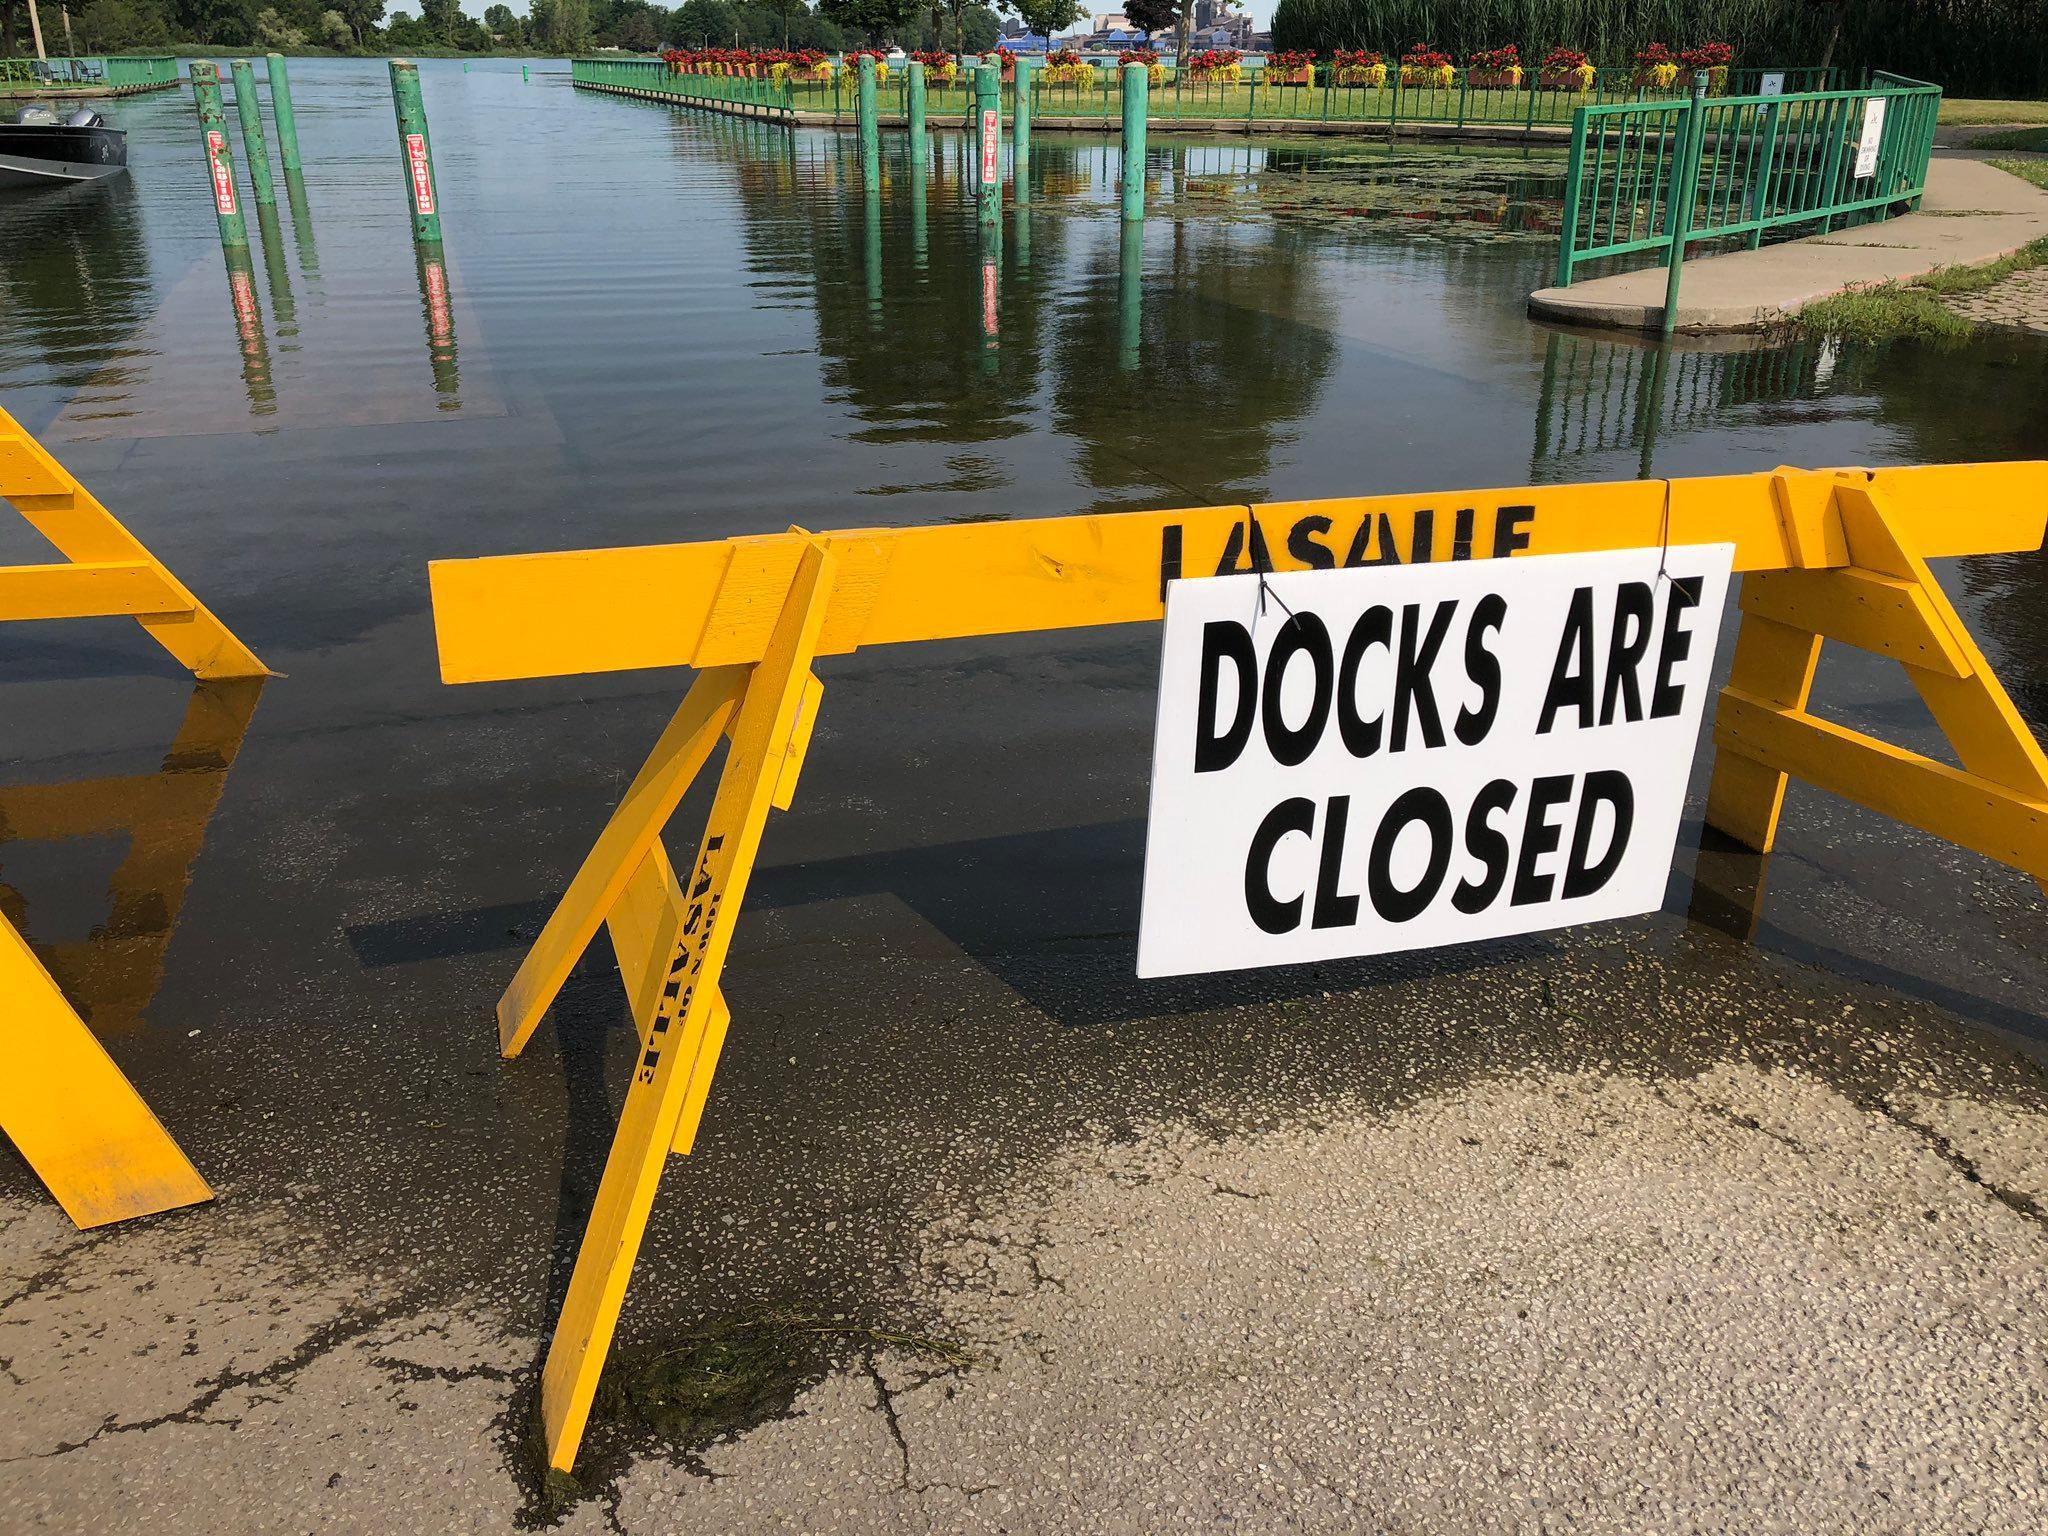 LaSalle Boat Ramp Closed